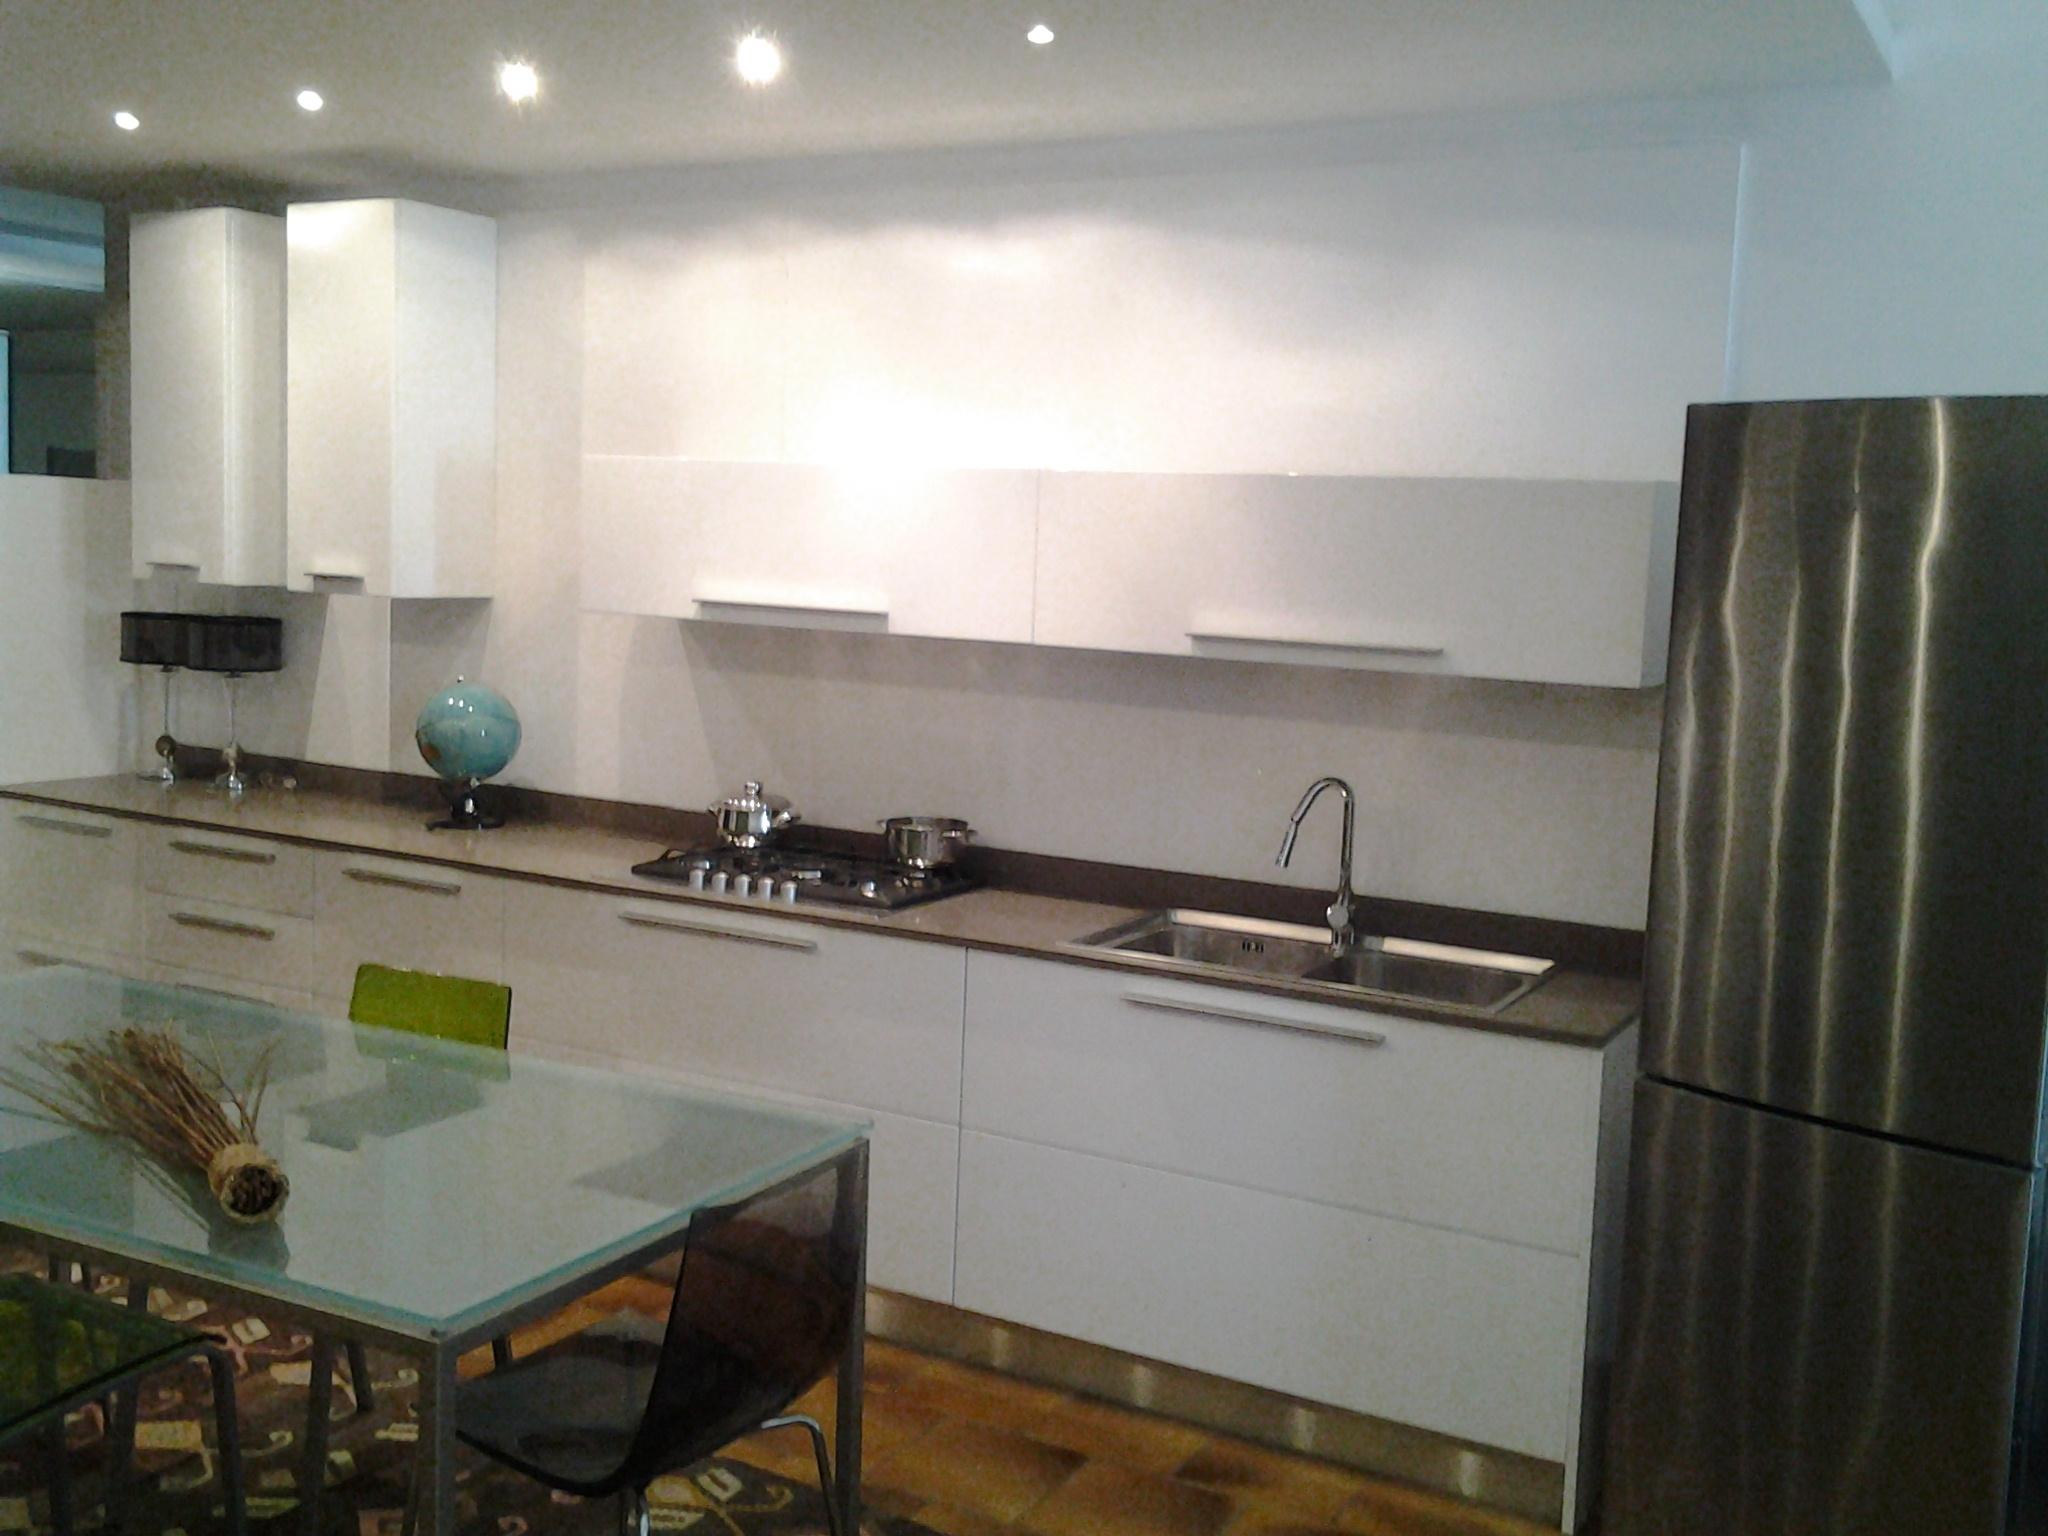 Arredo3 cucina siria moderno polimerico lucido bianca for Cucine moderne prezzi bassi